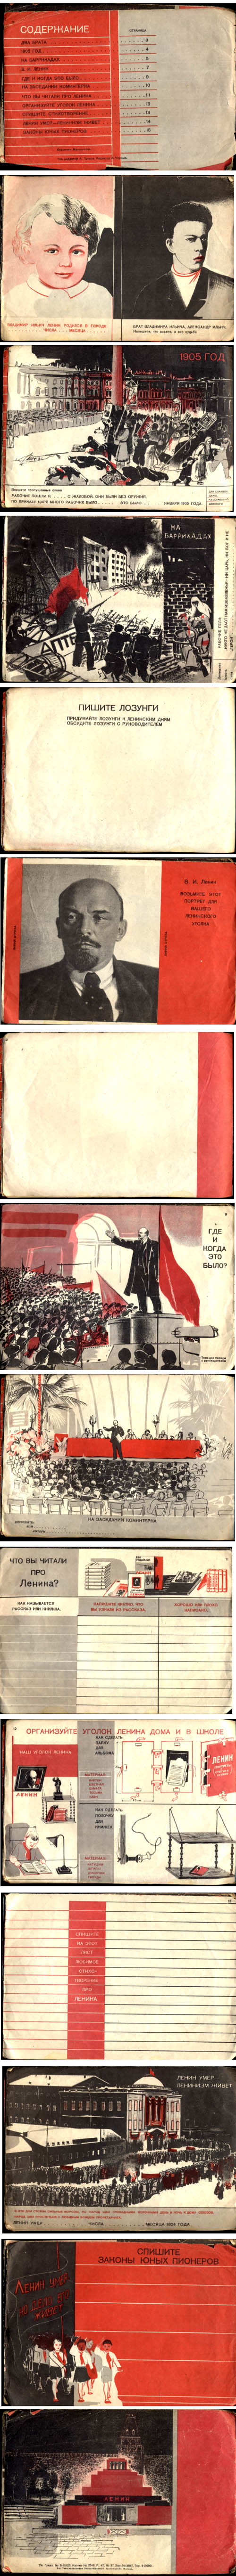 Lenin the Idol 2